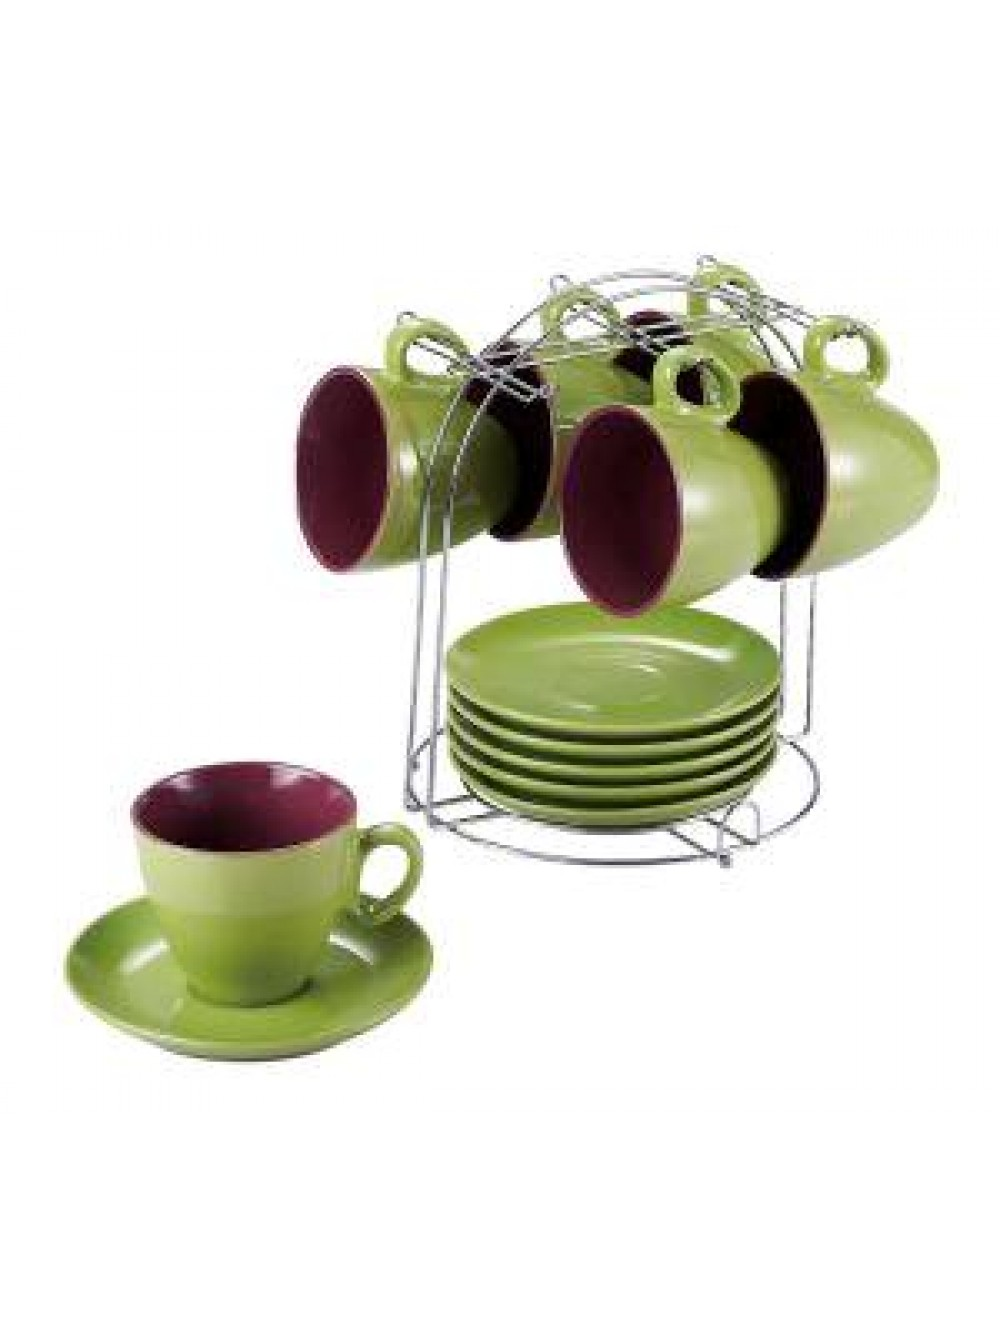 http://kitchenshop.com.ua/image/cache/catalog/wellberg_wb_20301-1000x1340.jpg